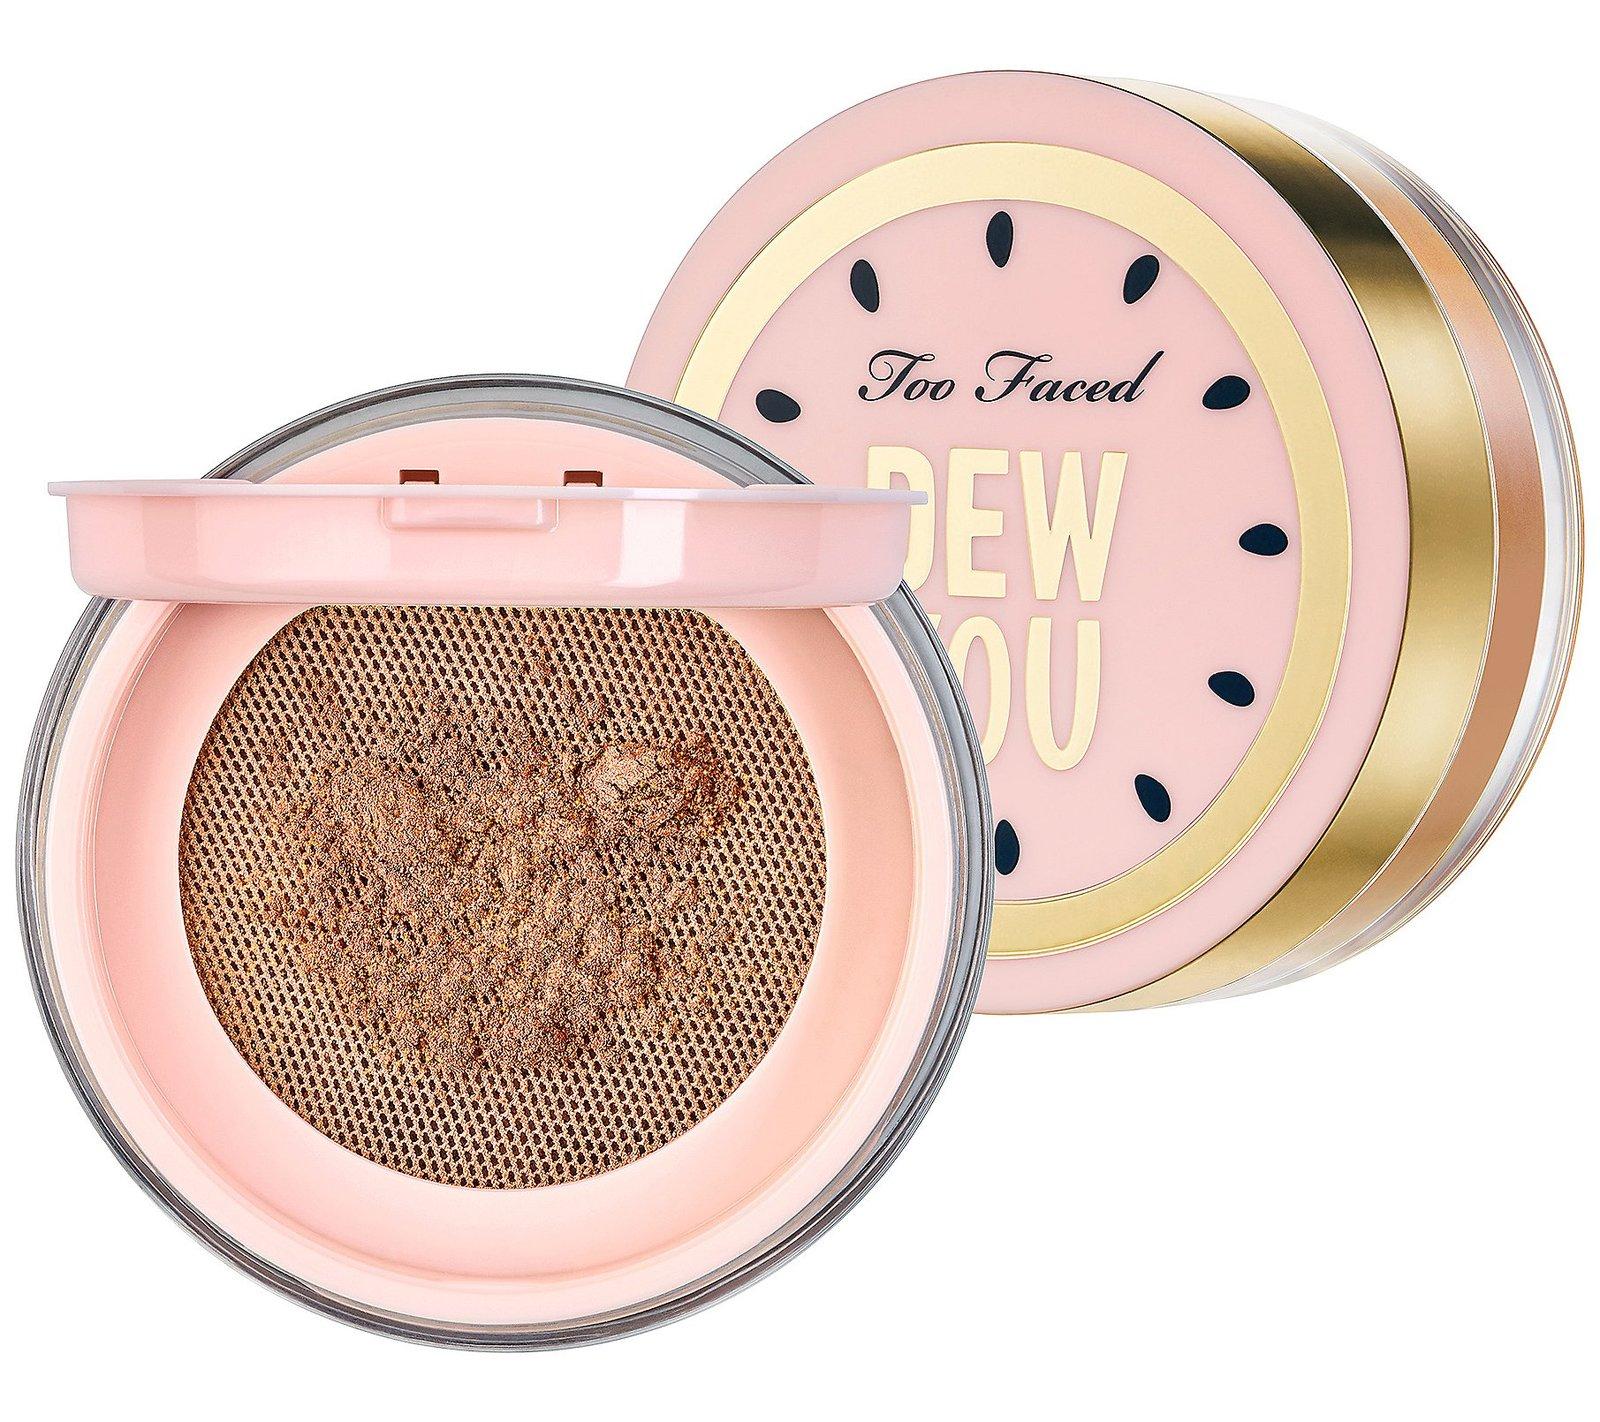 Too Faced Dew You Fresh Glow Translucent Setting Powder - Radiant Pearl - $28.99